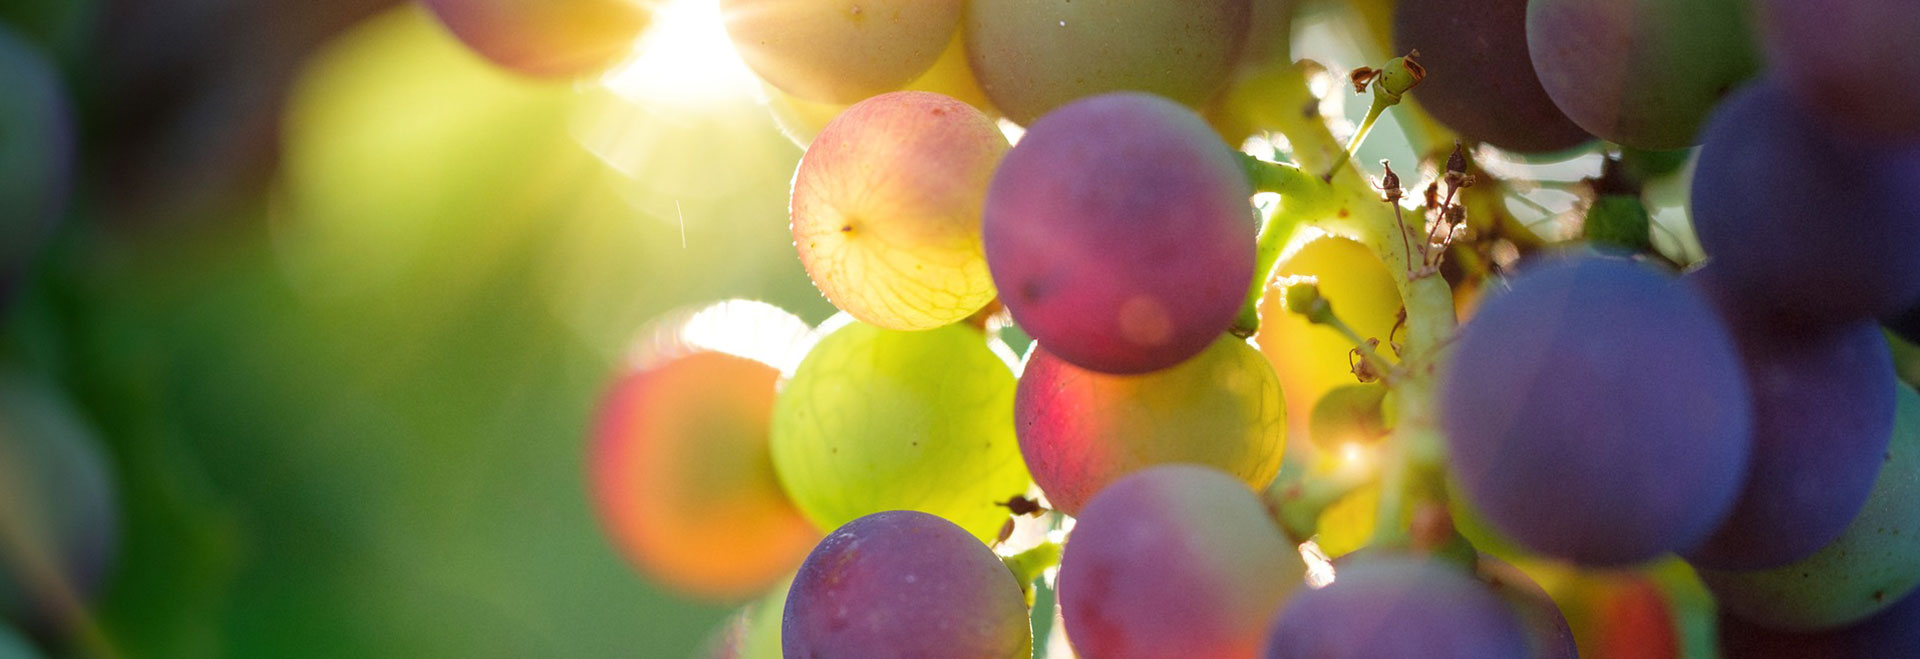 Winemaker Saumurois Distre